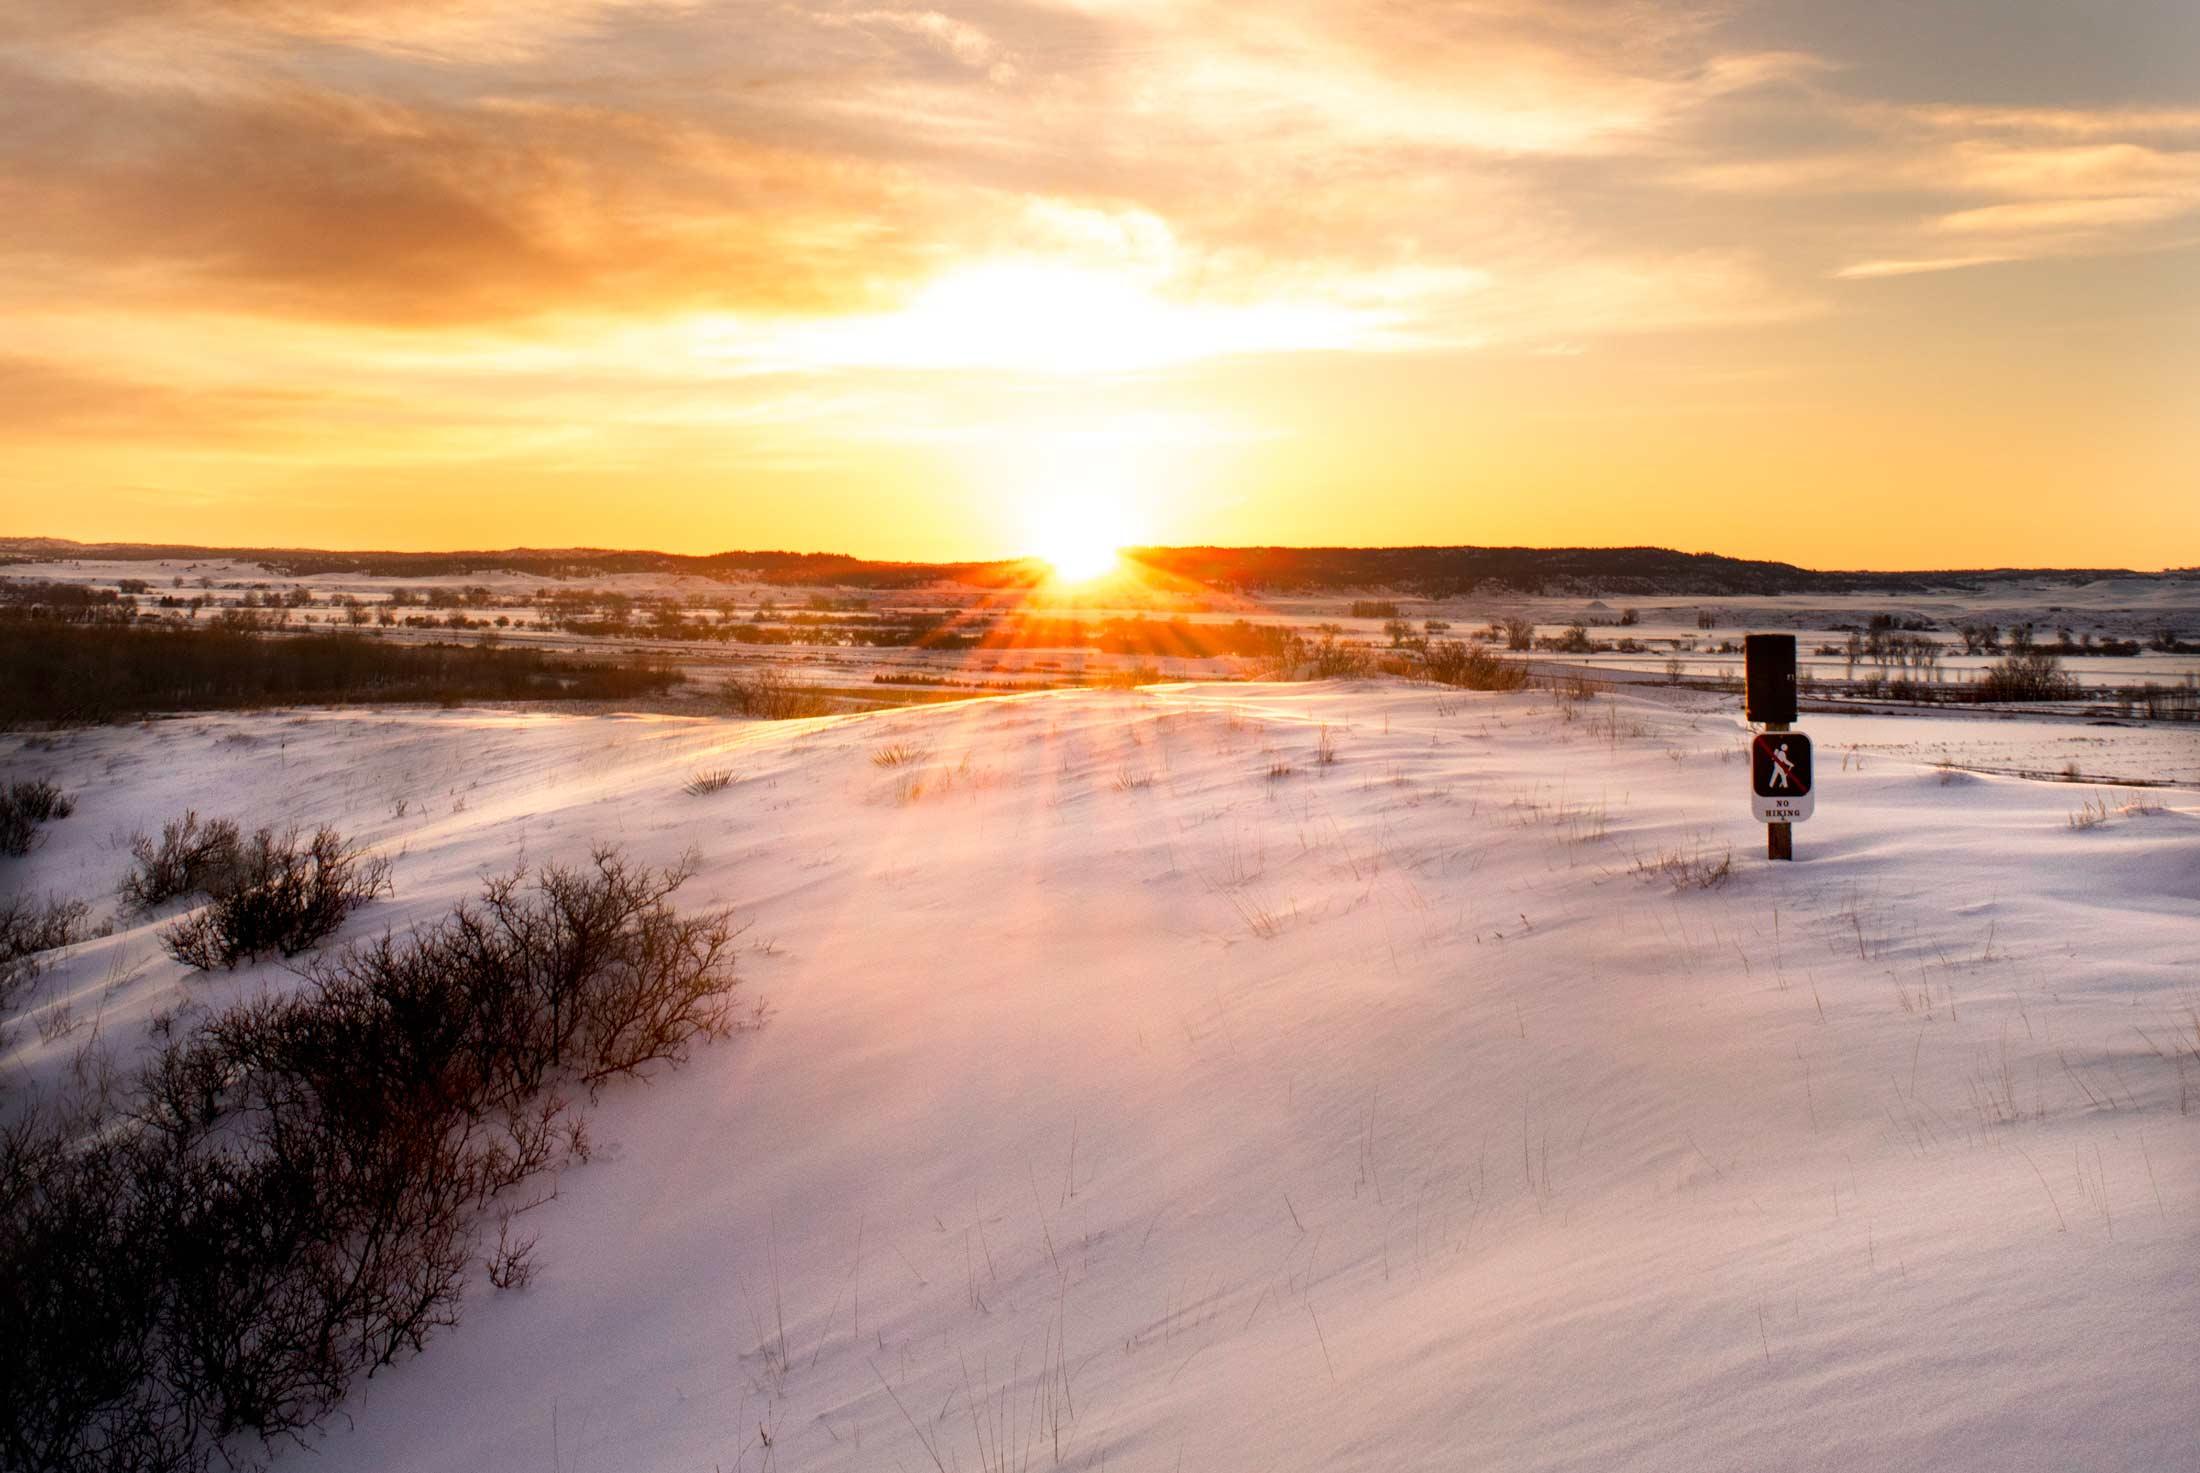 Unexpected Winter Activities in Southeast Montana